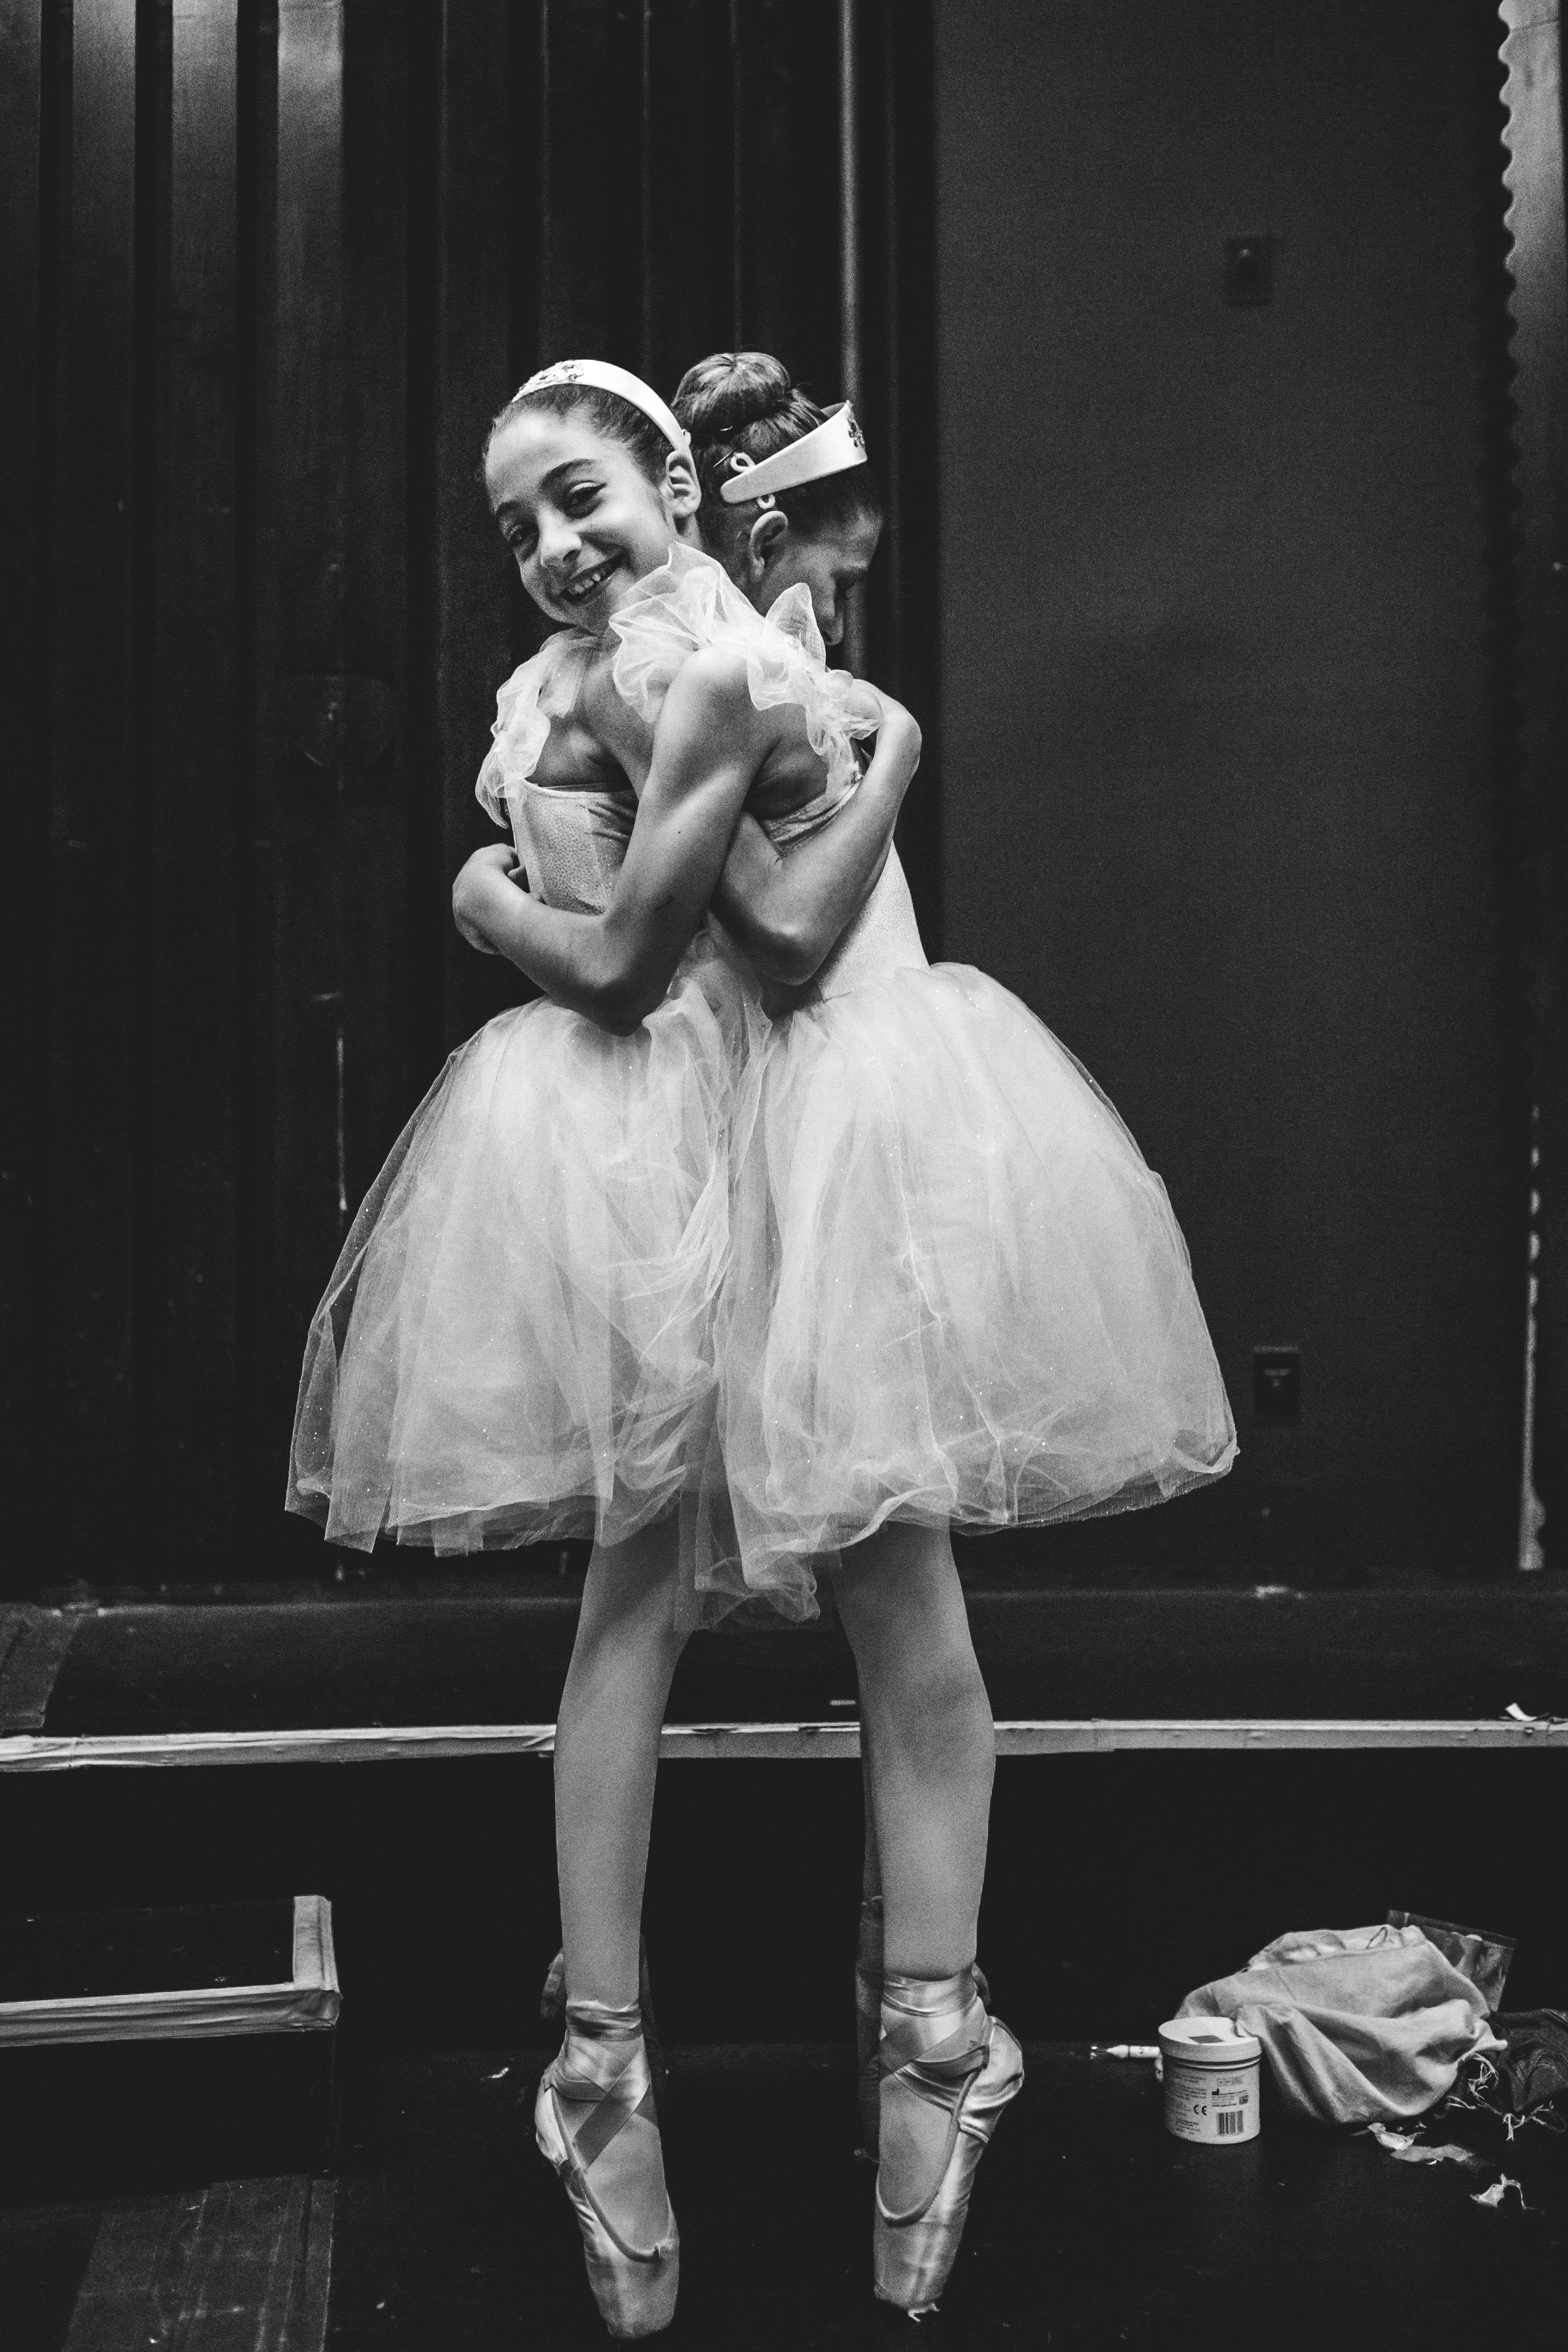 Ballerina hug